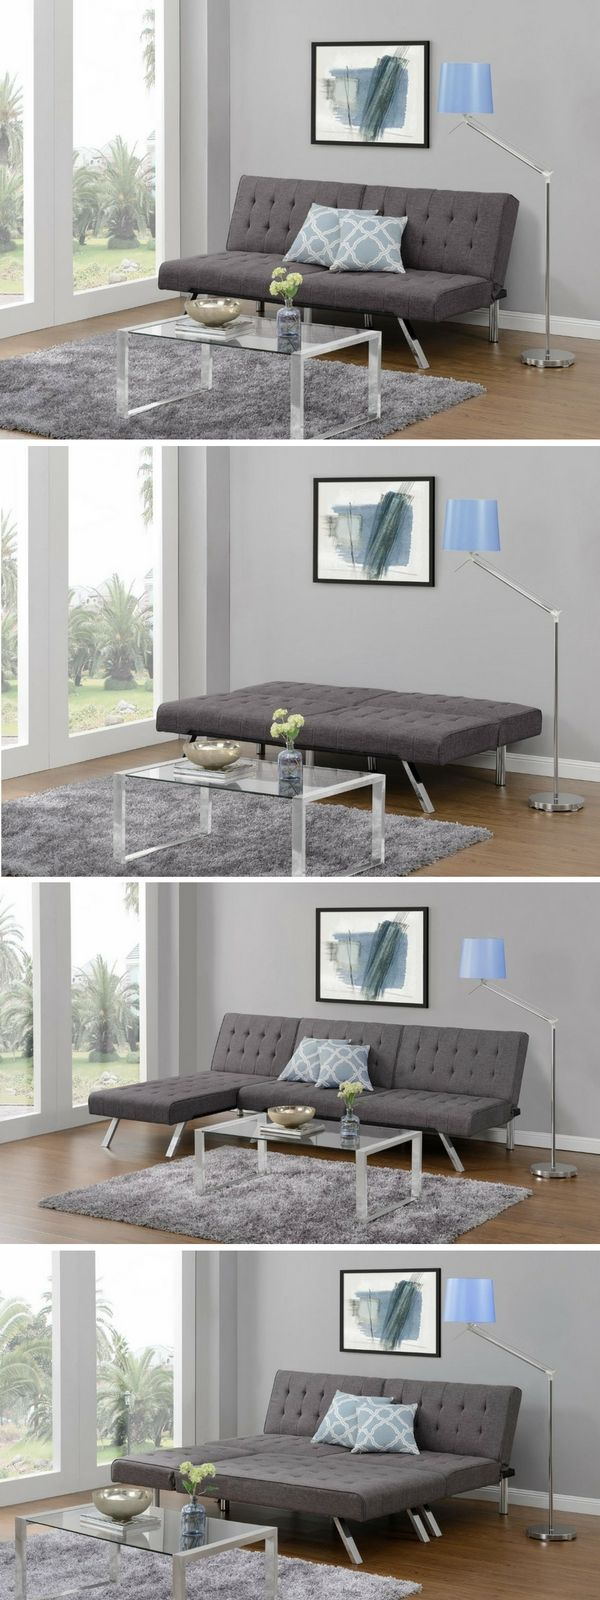 check out the dhp emily convertible linen futon istandarddesign more - Futon Bedroom Ideas